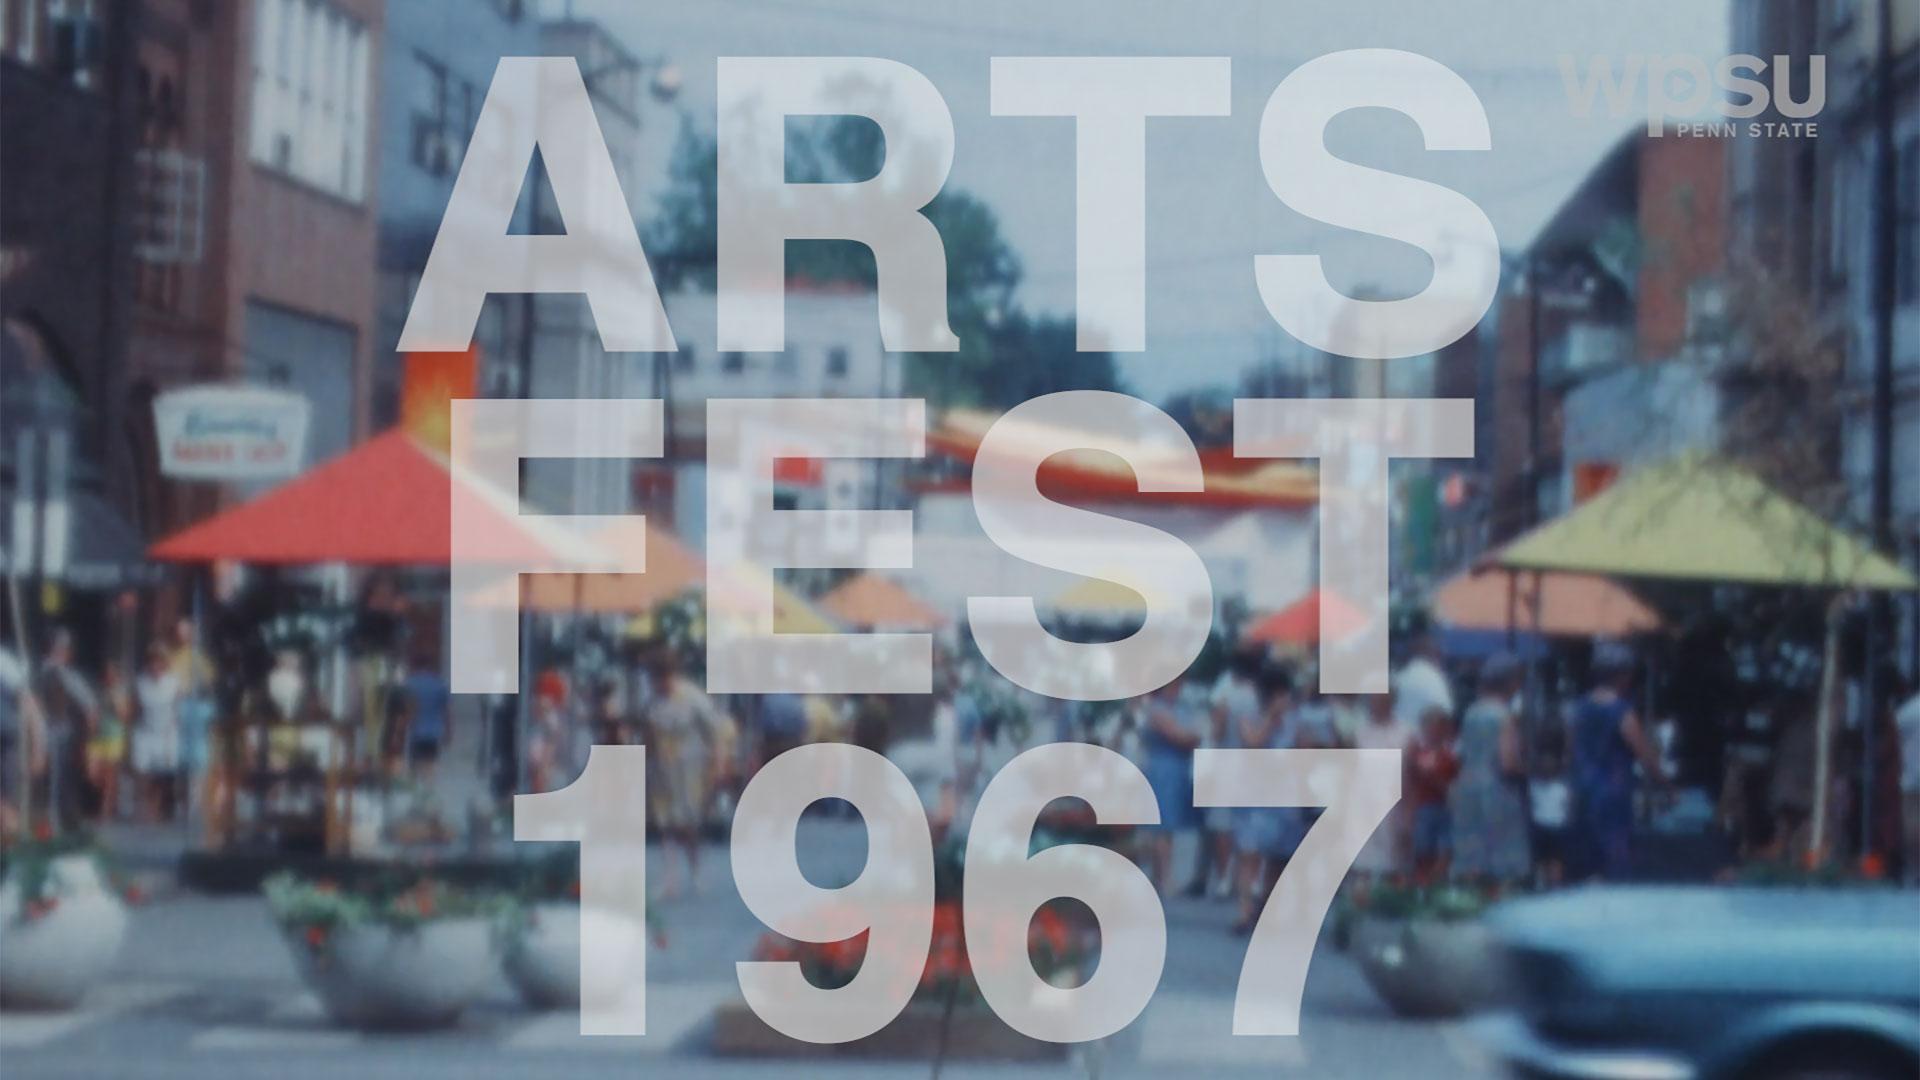 Arts Festival 1967